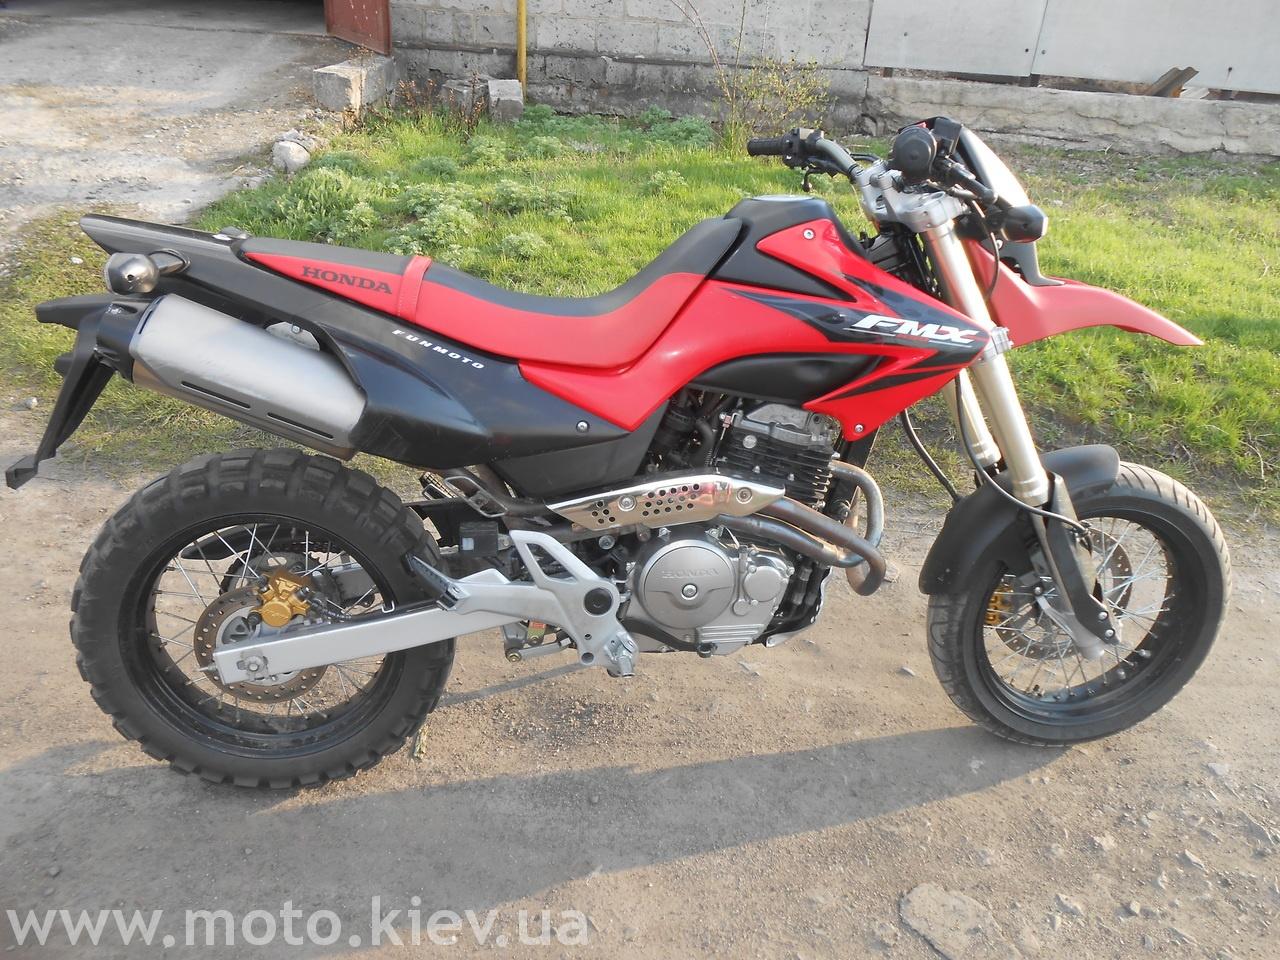 SUBJ: Мотоцикл  Honda FMX 650  10 USD Торг